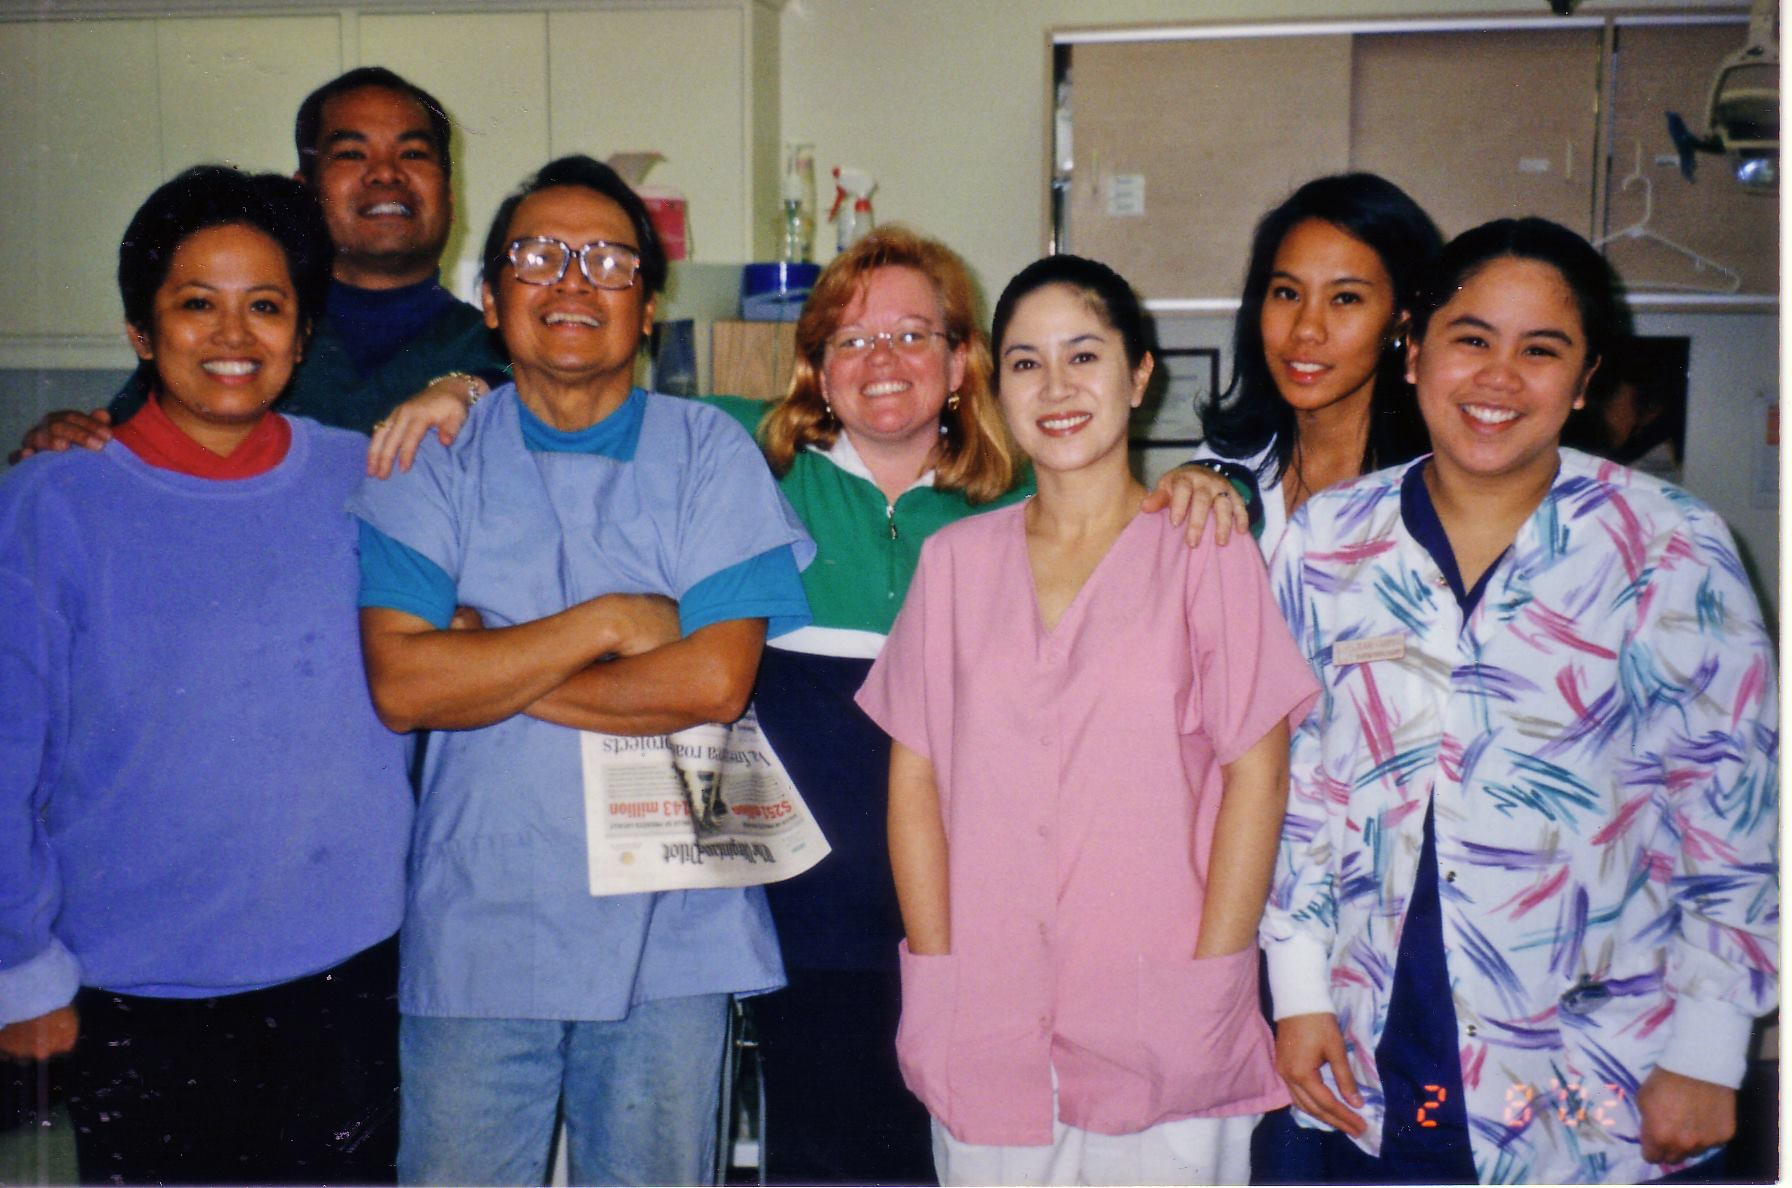 Allan L Bergano DDS reviews | Dental at 4460 Corporation Ln - Virginia Beach VA